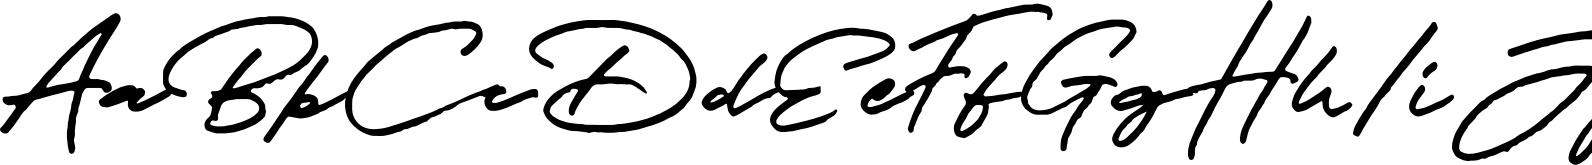 JV Signature (SVG Font)